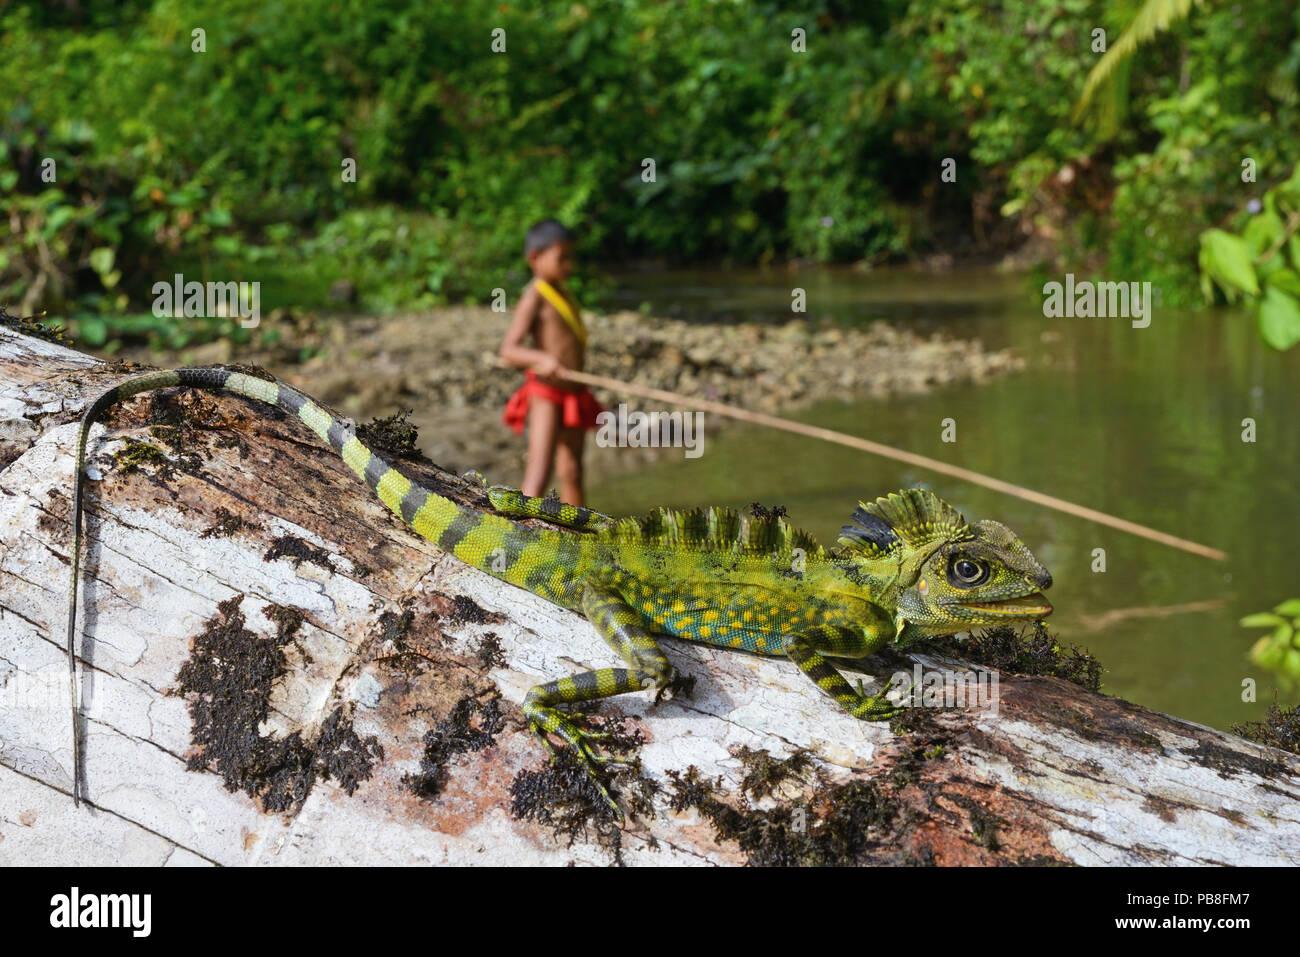 Giant forest dragon (Gonocephalus grandis) and Mentawai boy fishing, Siberut, Sumatra.  July 2016. - Stock Image